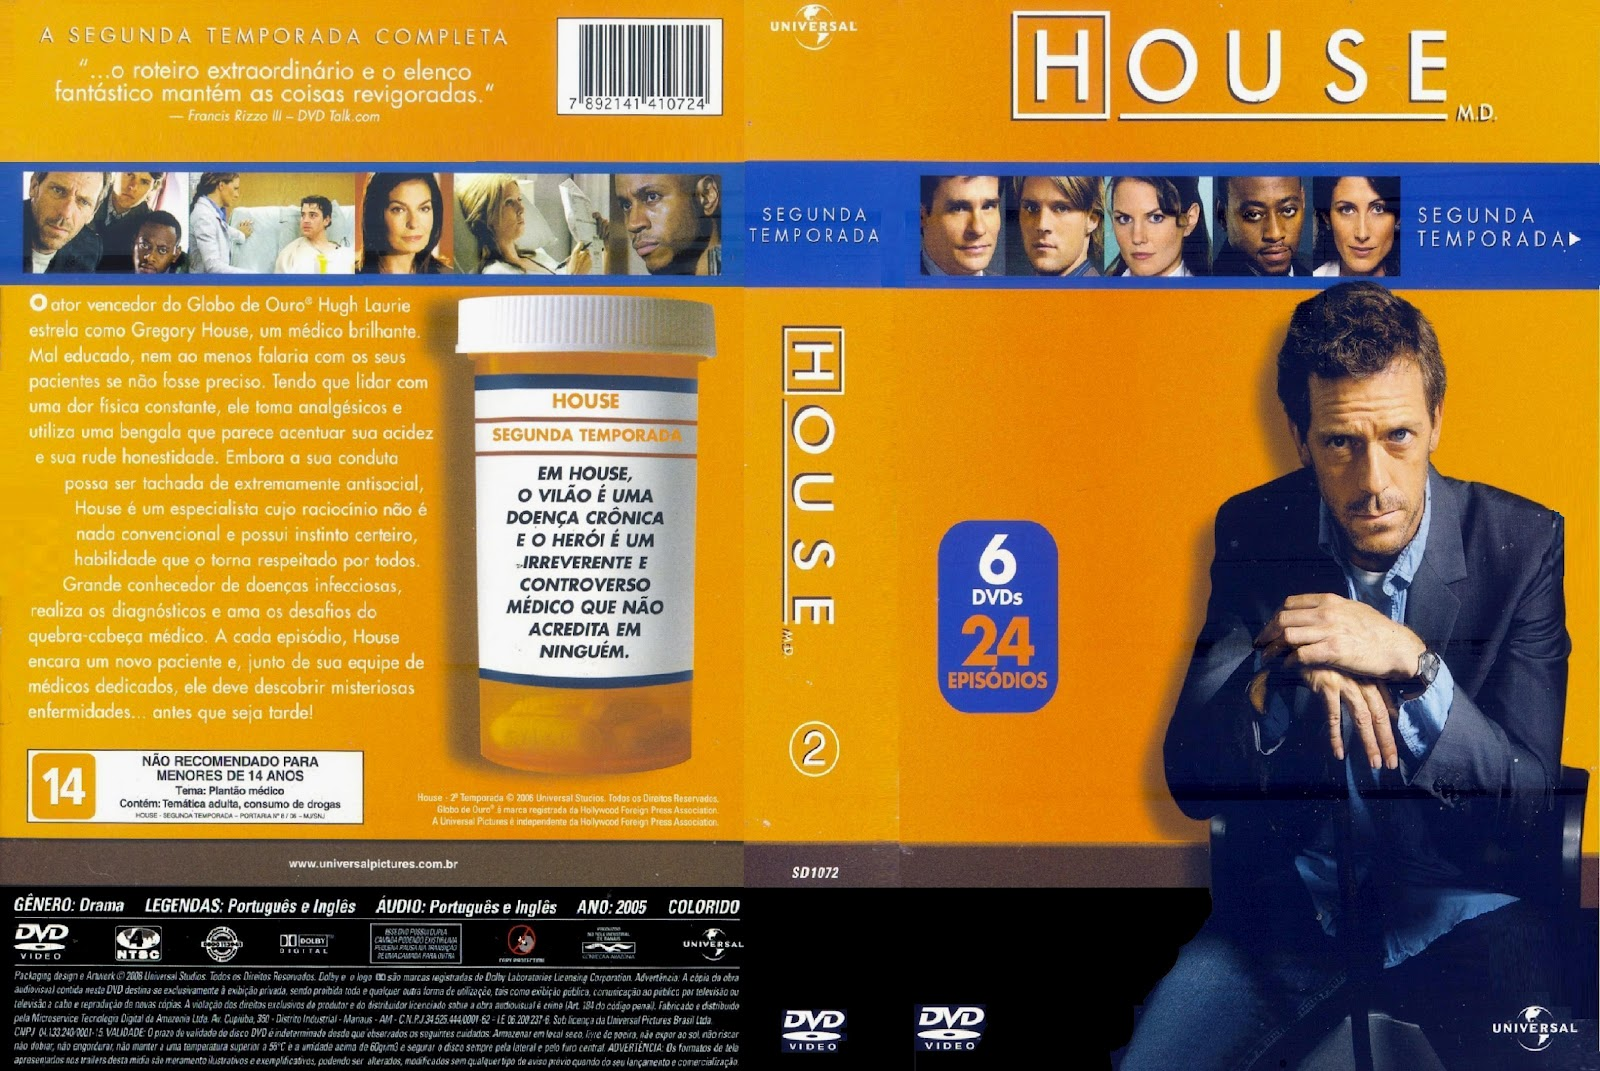 sunnyhd dr house 2 temporada 6 discos. Black Bedroom Furniture Sets. Home Design Ideas